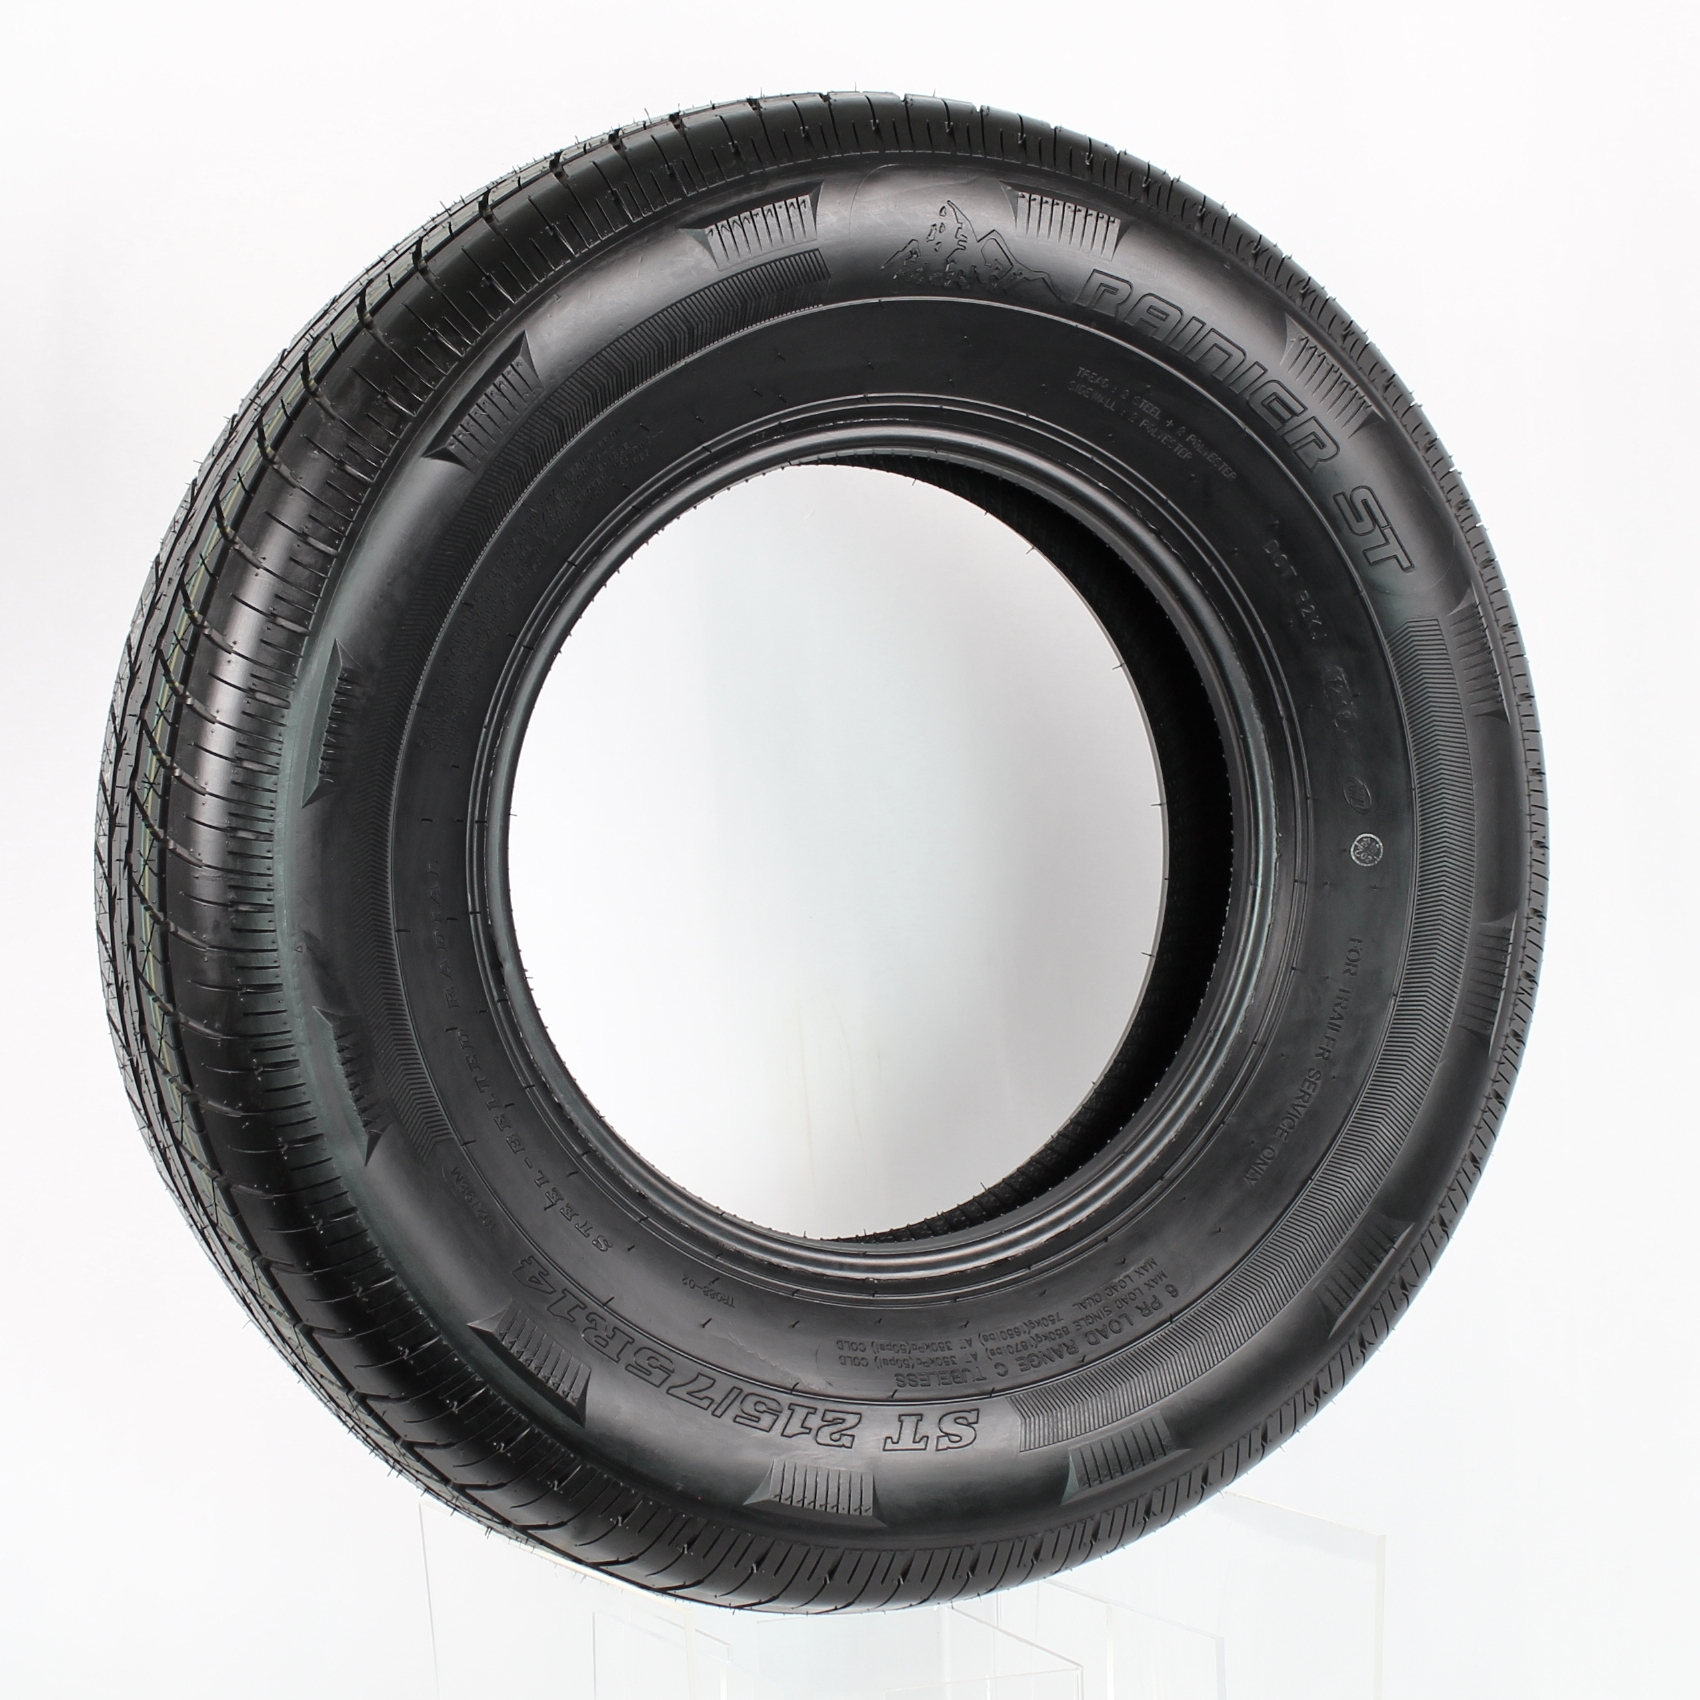 Rainier ST215/75R14 LRC 6-Ply Radial Trailer Tire Image